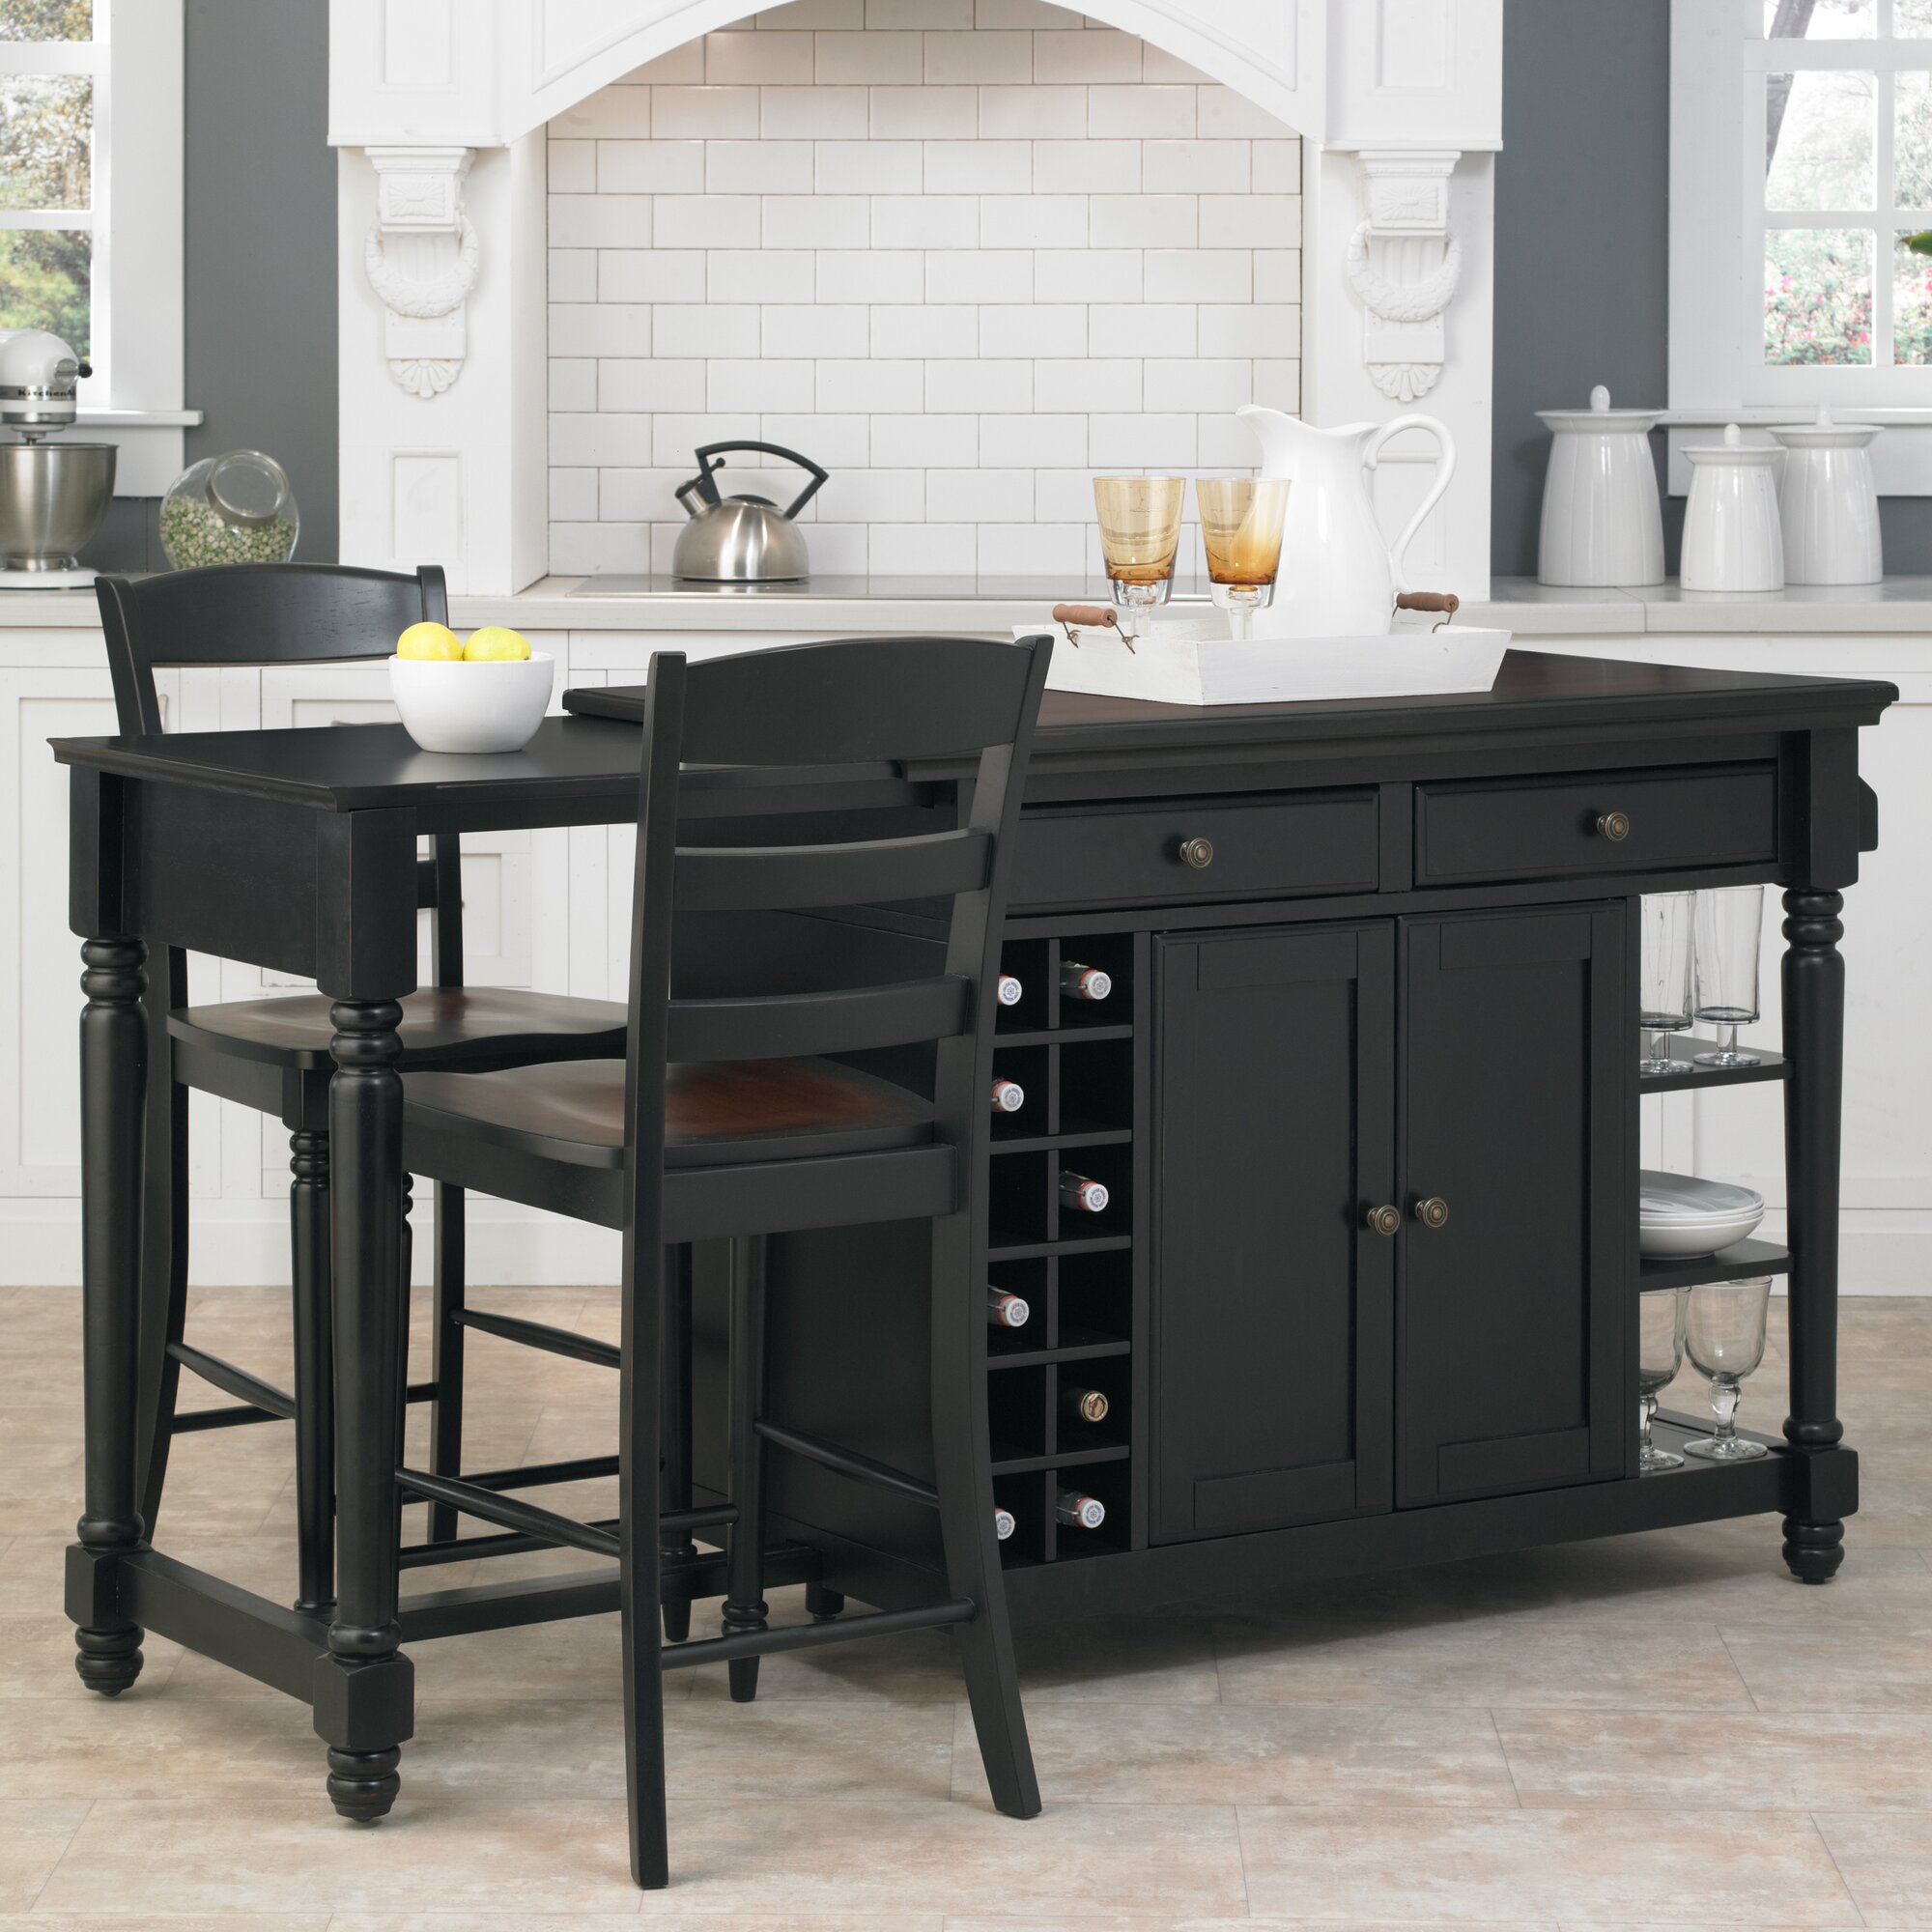 Darby Home Co Cleanhill 3 Piece Kitchen Island Set u0026 Reviews Wayfair